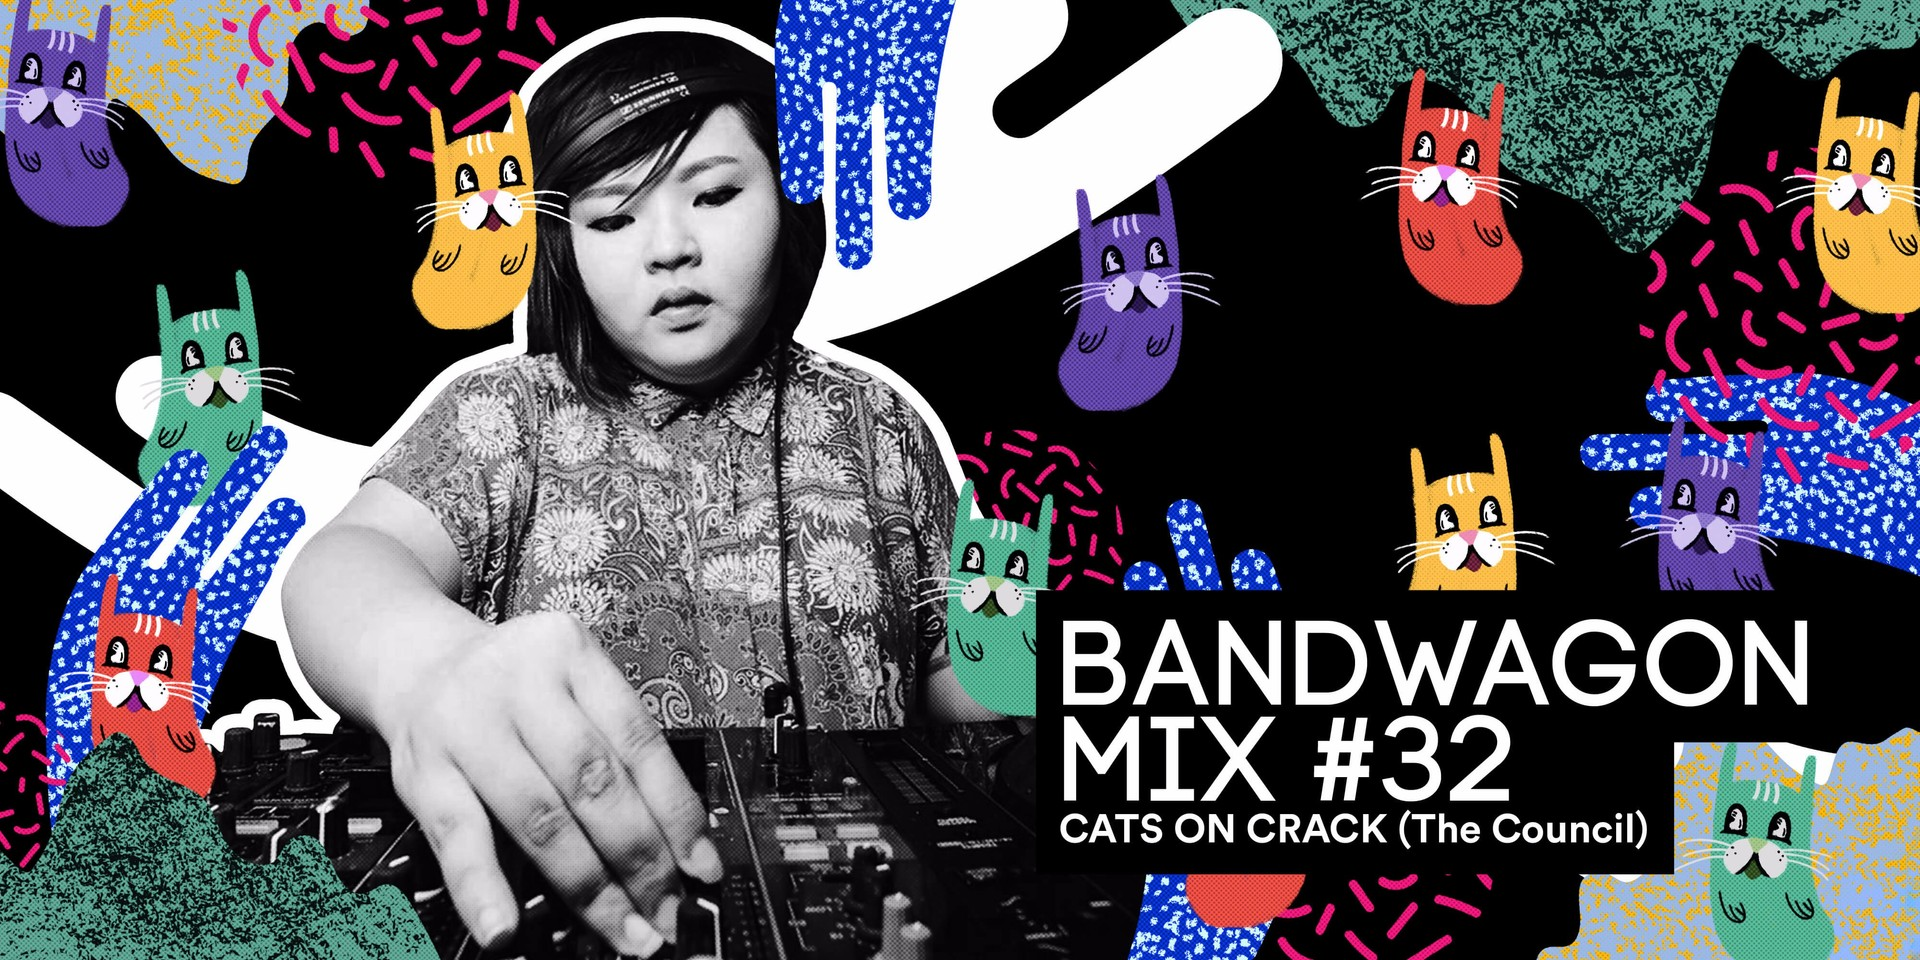 Bandwagon Mix #32: CATS ON CRACK (The Council)